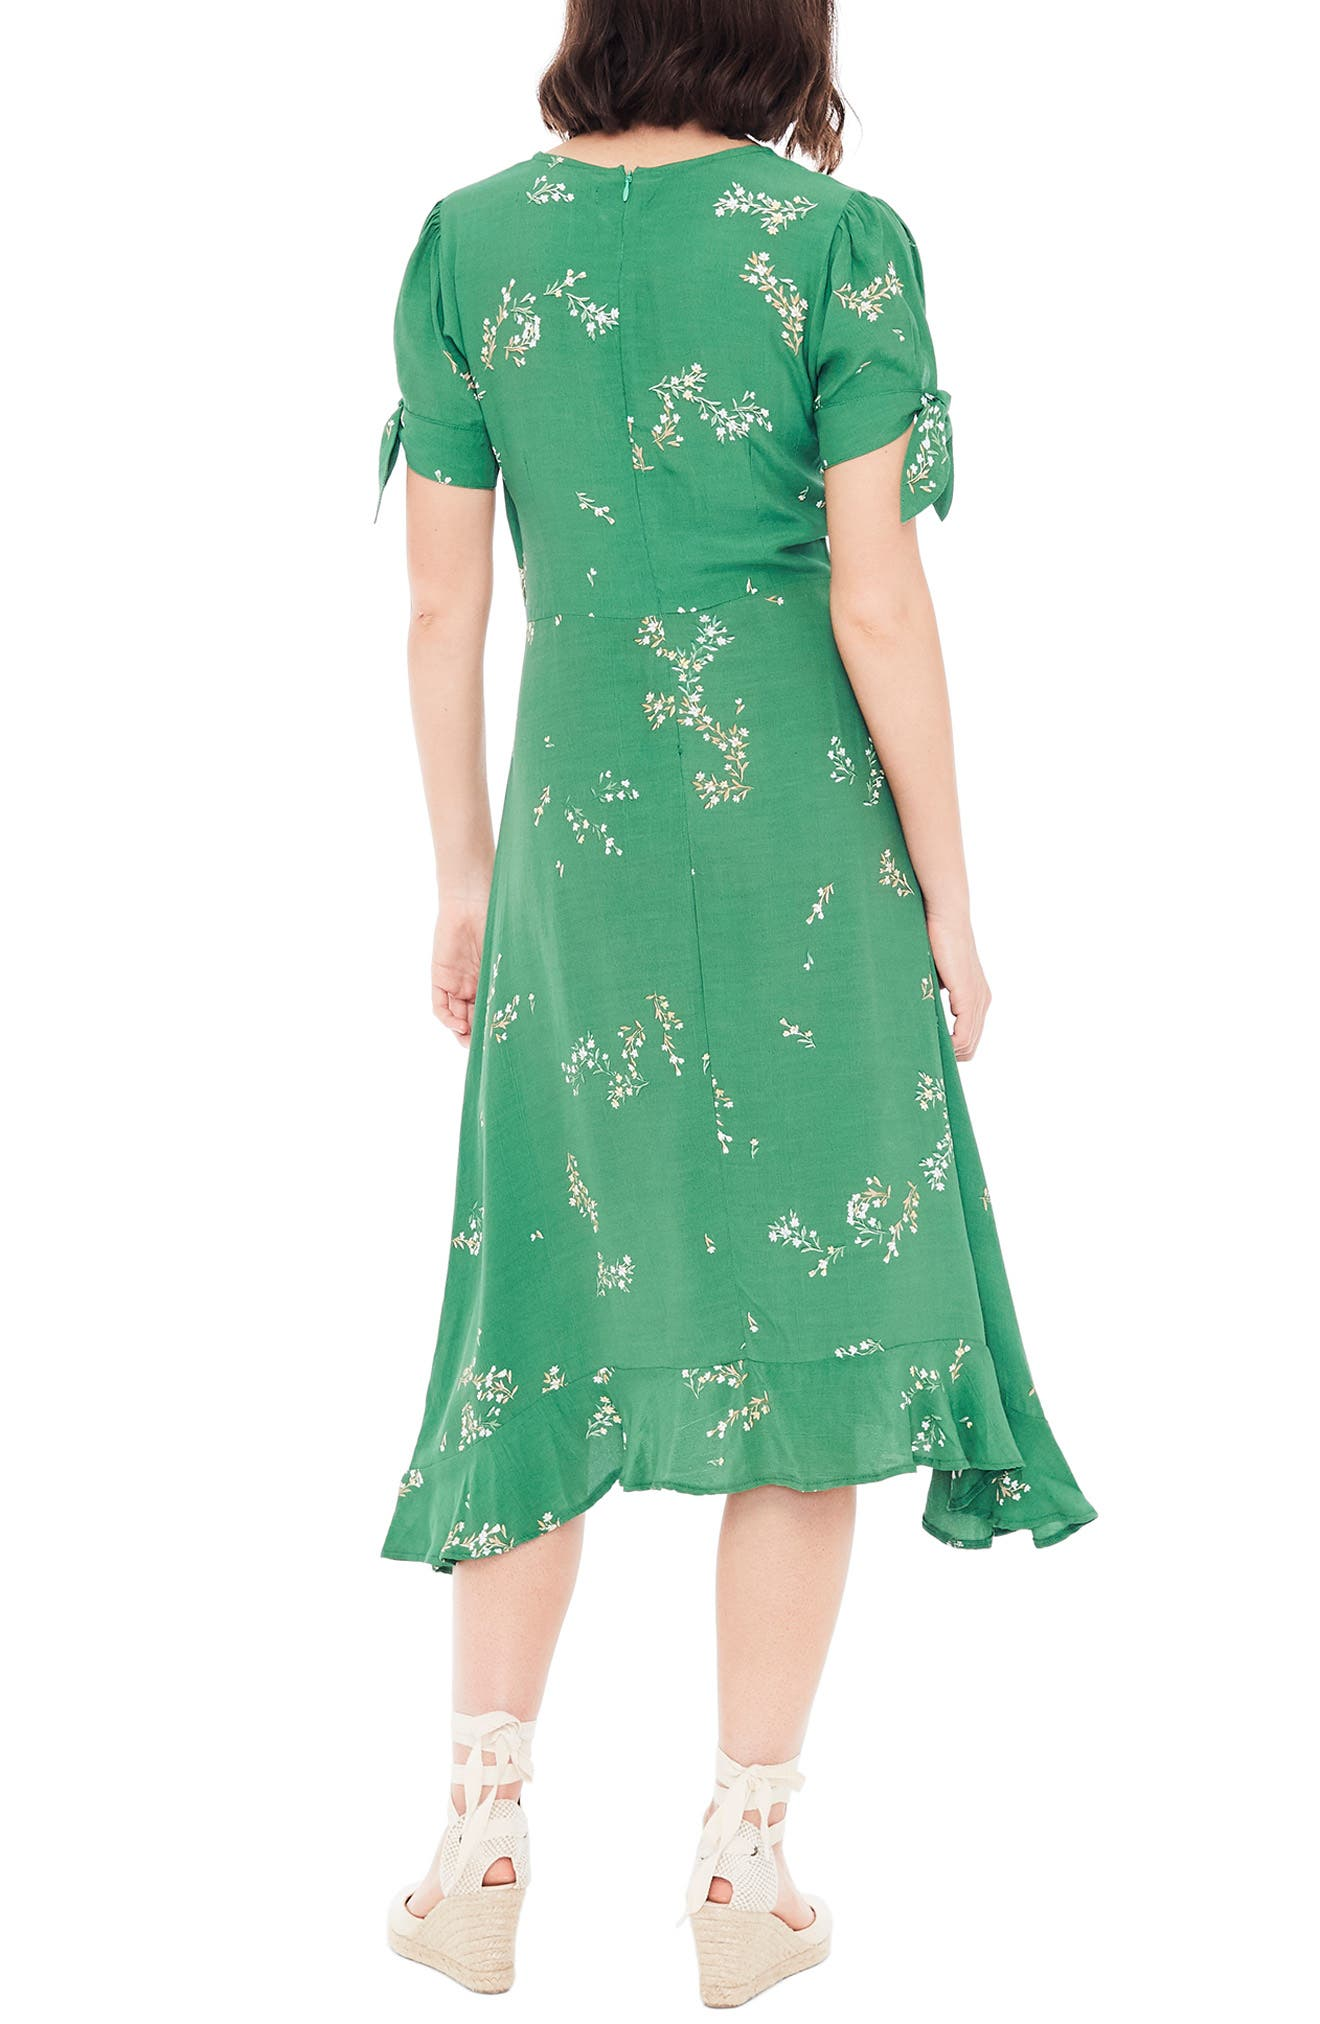 FAITHFULL THE BRAND, Emilia Floral Midi Dress, Alternate thumbnail 2, color, MYRTILLE FLORAL PRINT - GREEN